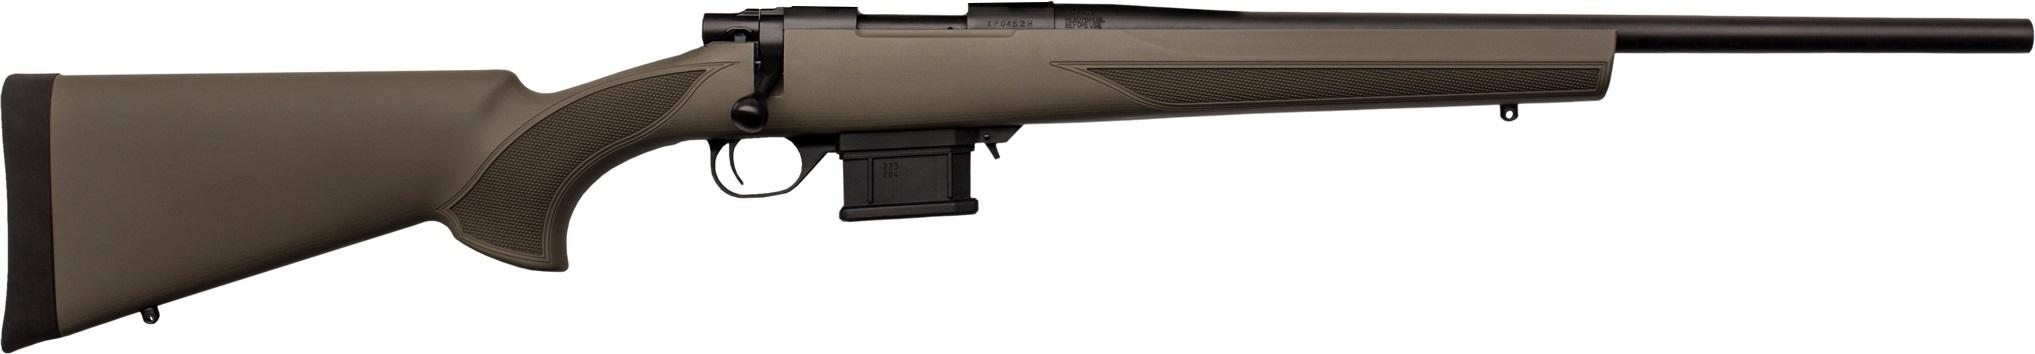 HOWA M1500 Mini Action 223 Rem